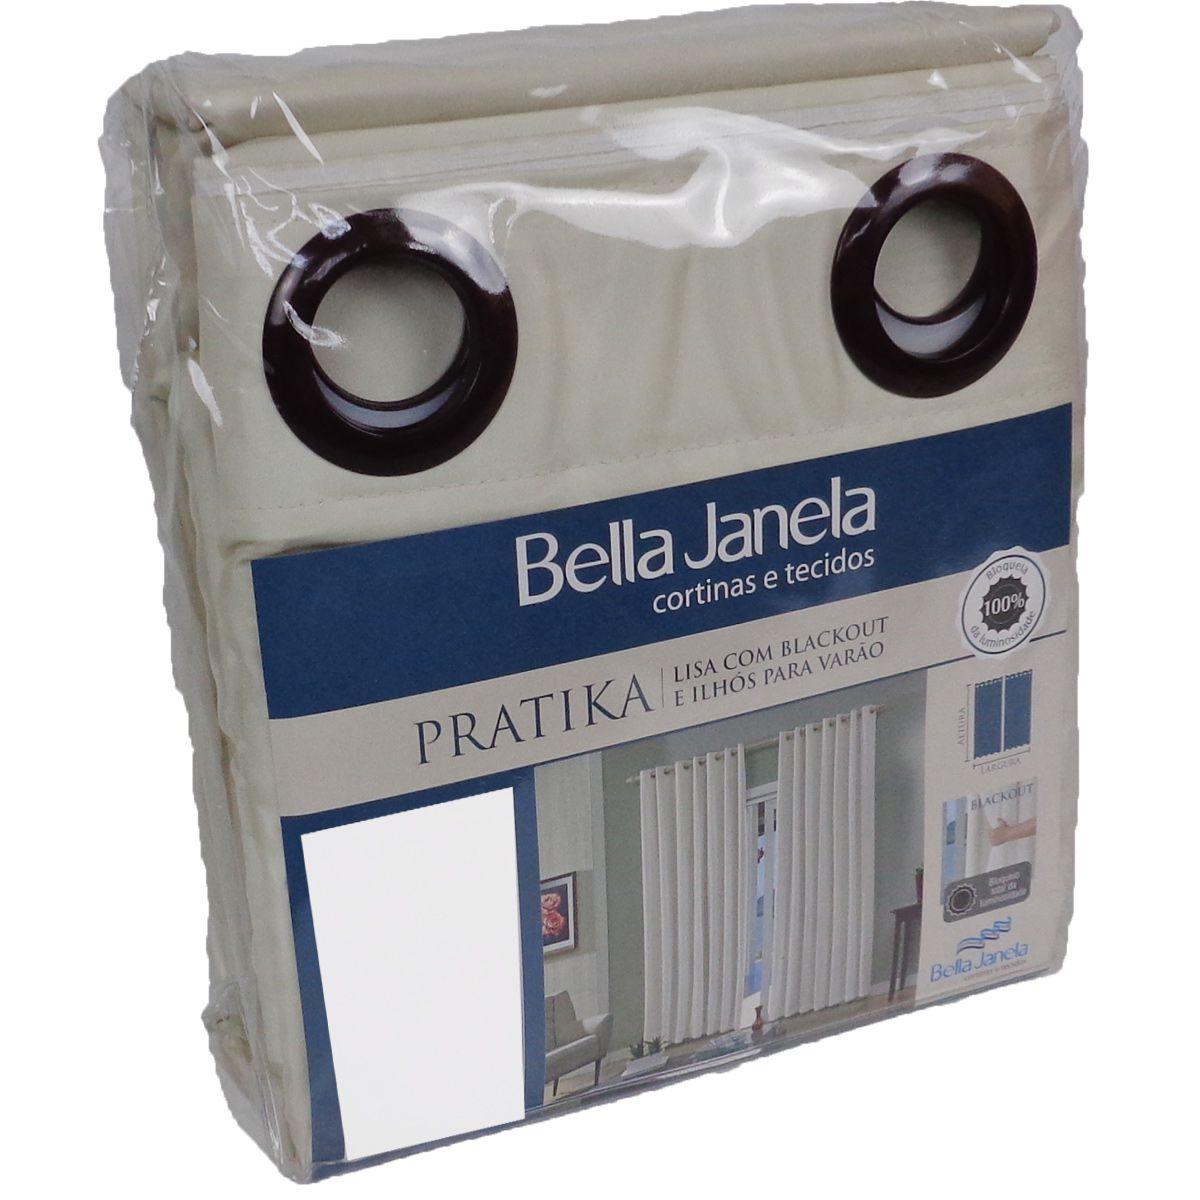 Cortina Blackout Areia Pratika Lisa Slim 2,60 X 2,30 Bella Janela